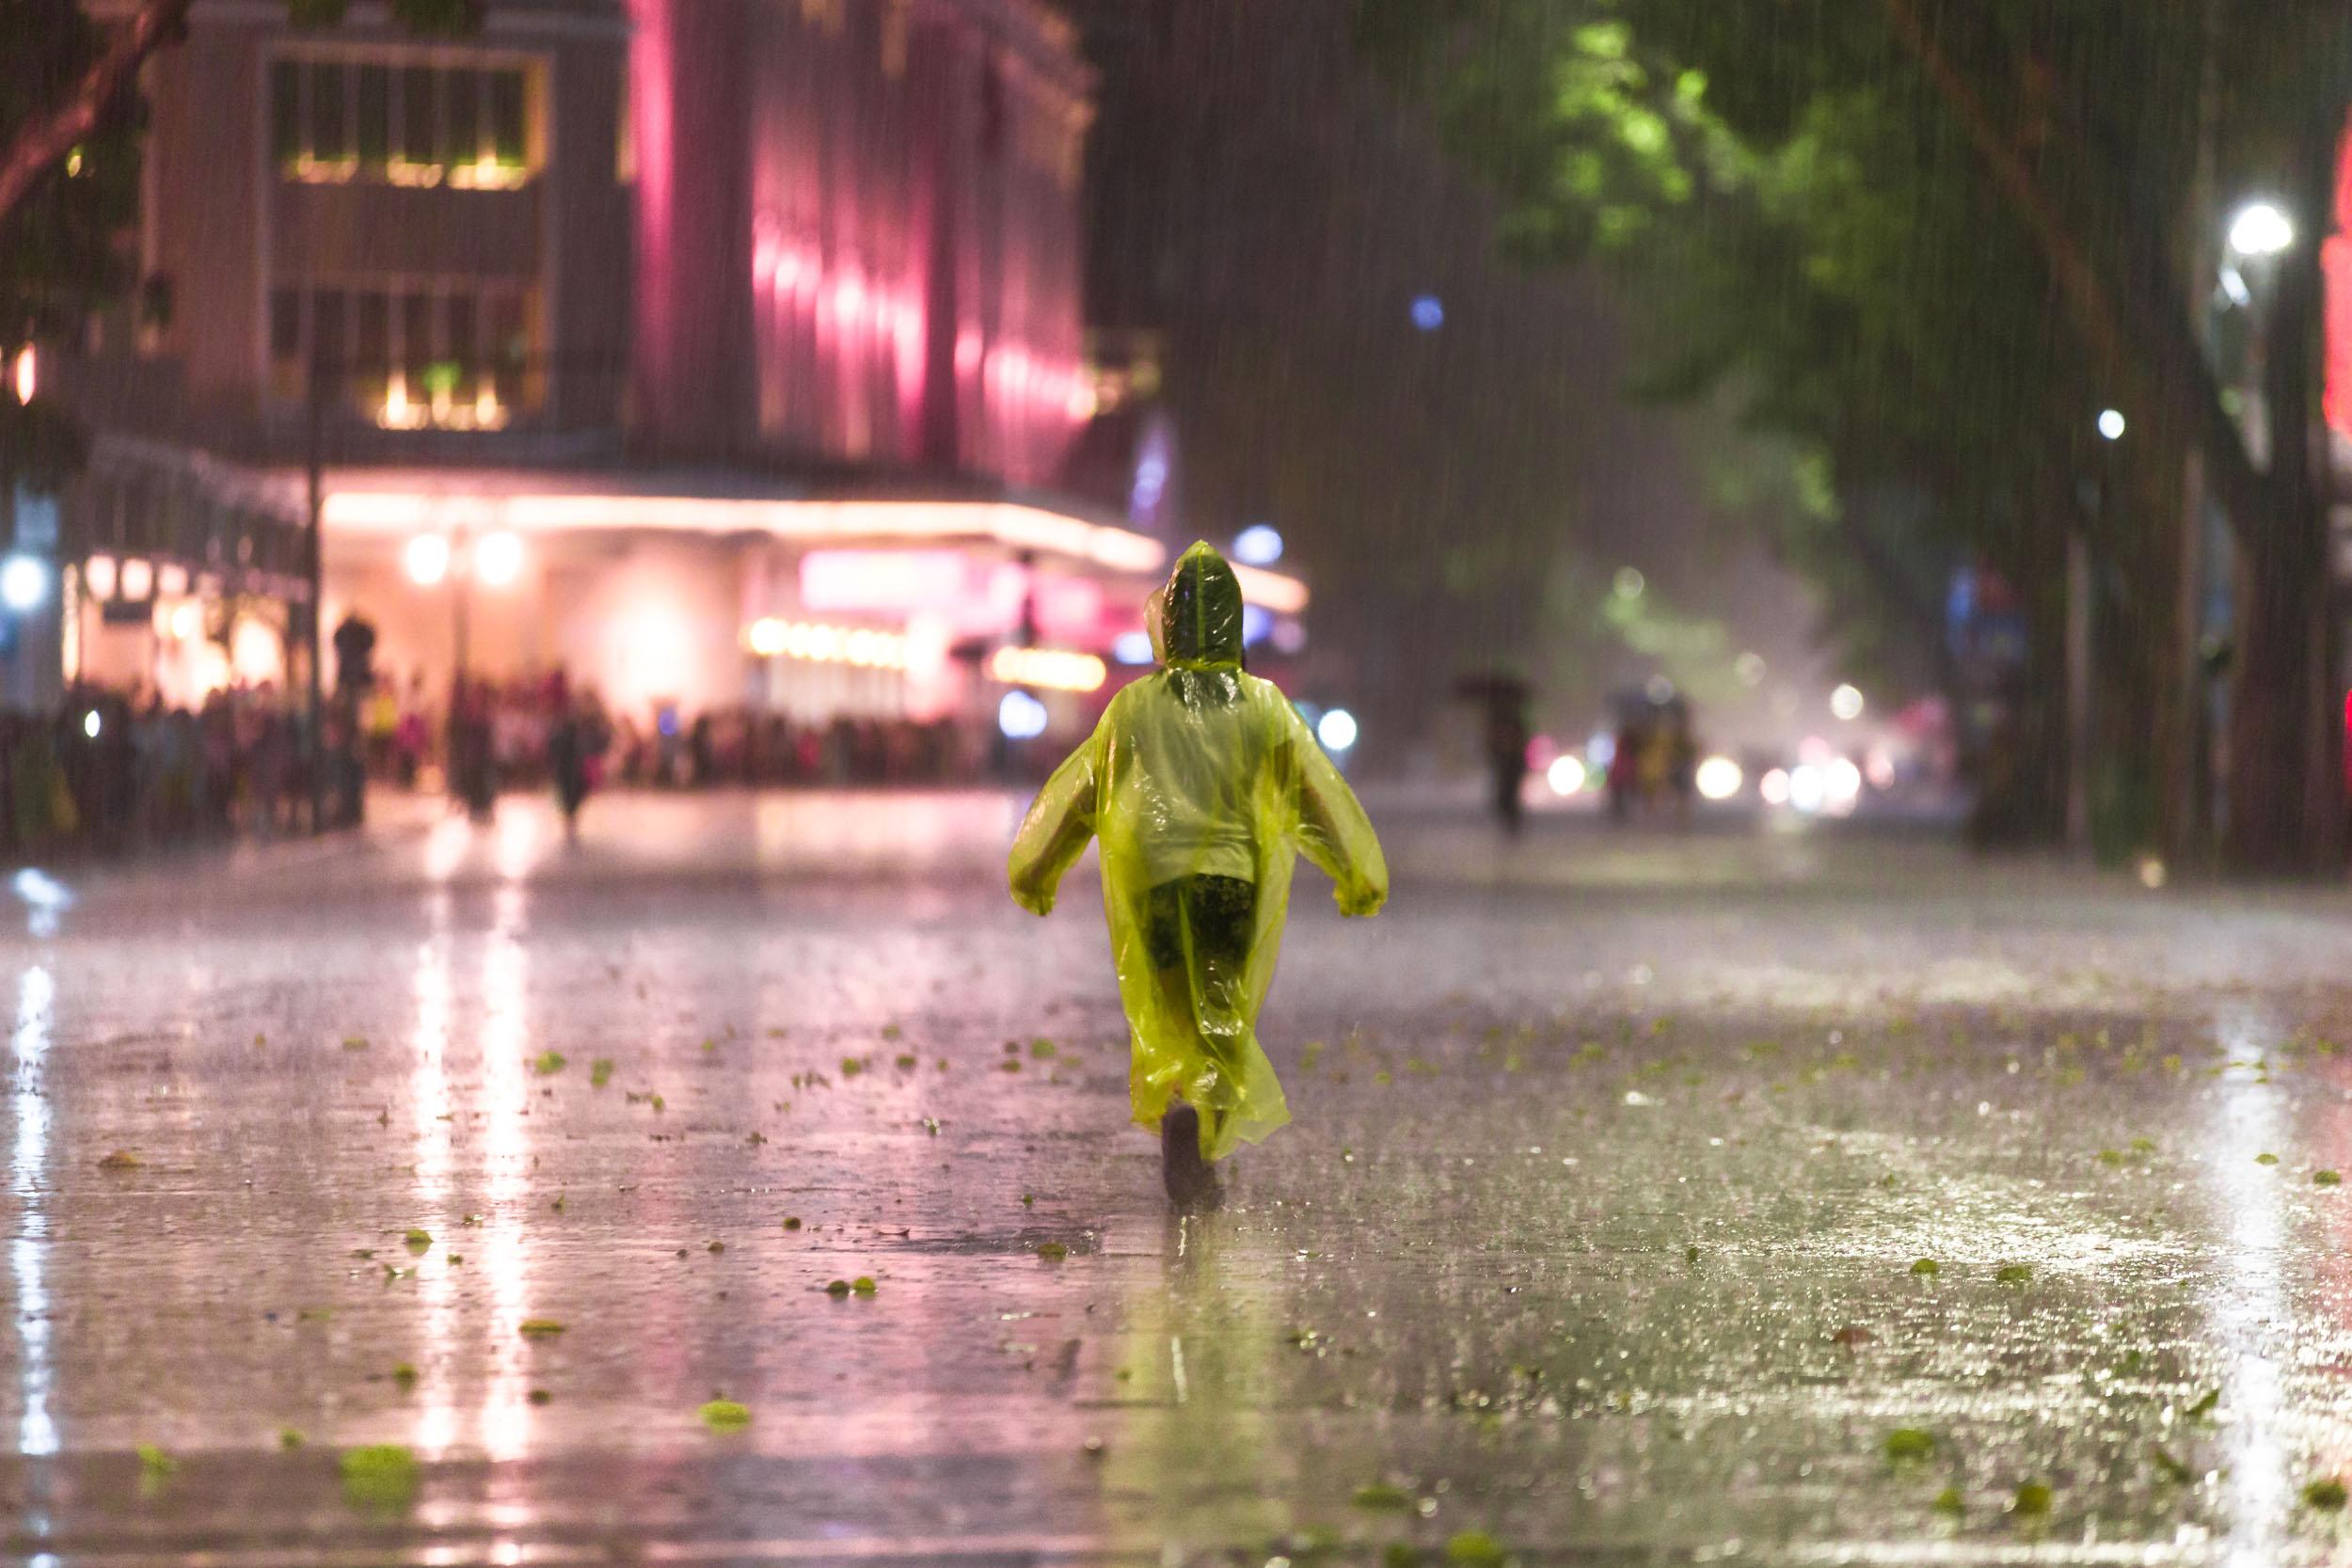 Girl on street in Poncho under heavy rain in Hanoi.